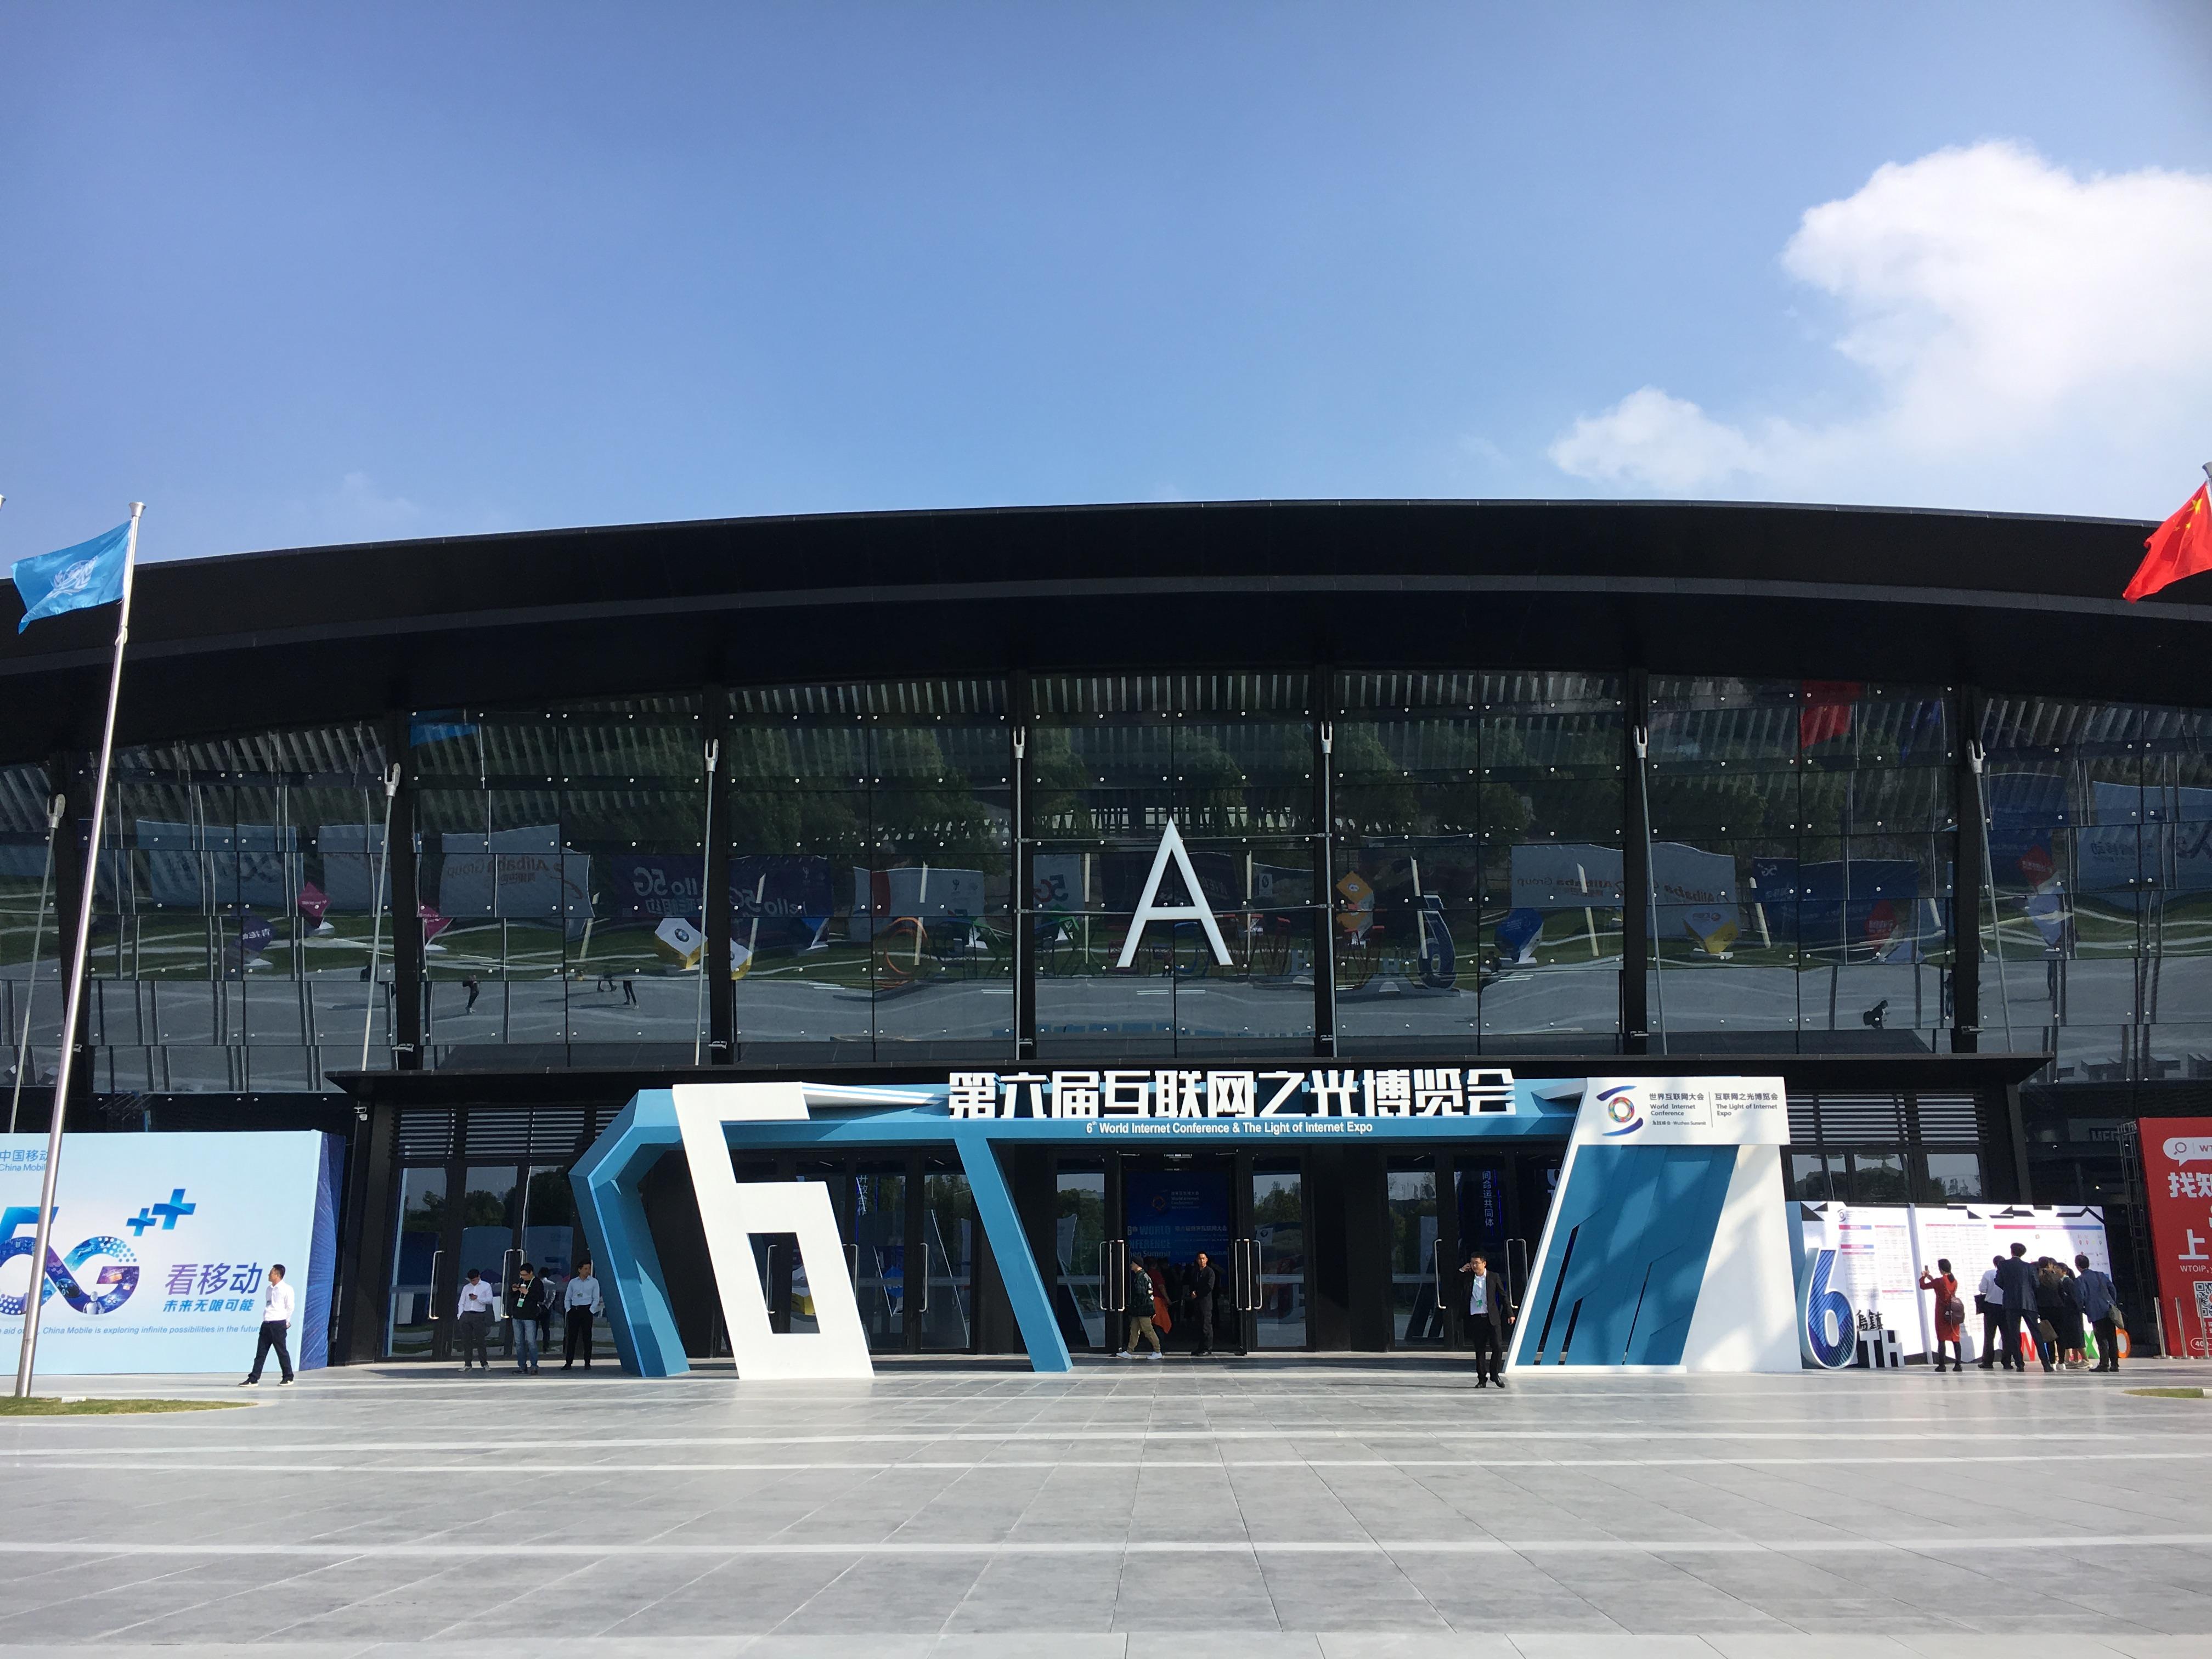 <b>梦网科技亮相2019世界互联网大会,云通信扬帆5G新时代</b>